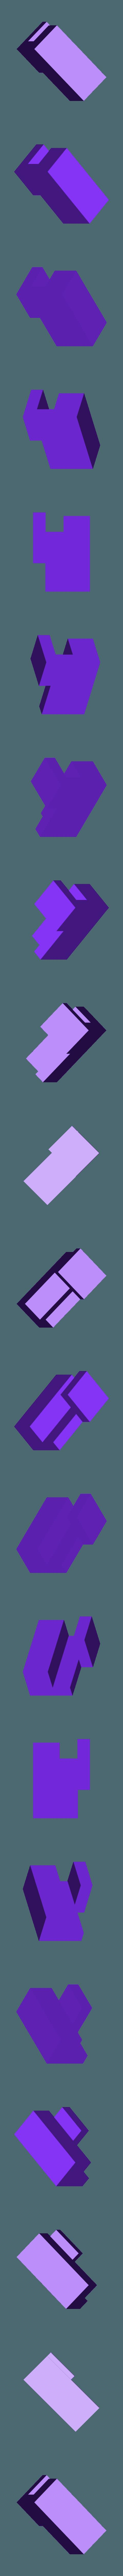 gear-rail-boxA.stl Download free STL file Mechnolia • 3D printing template, ChrisBobo